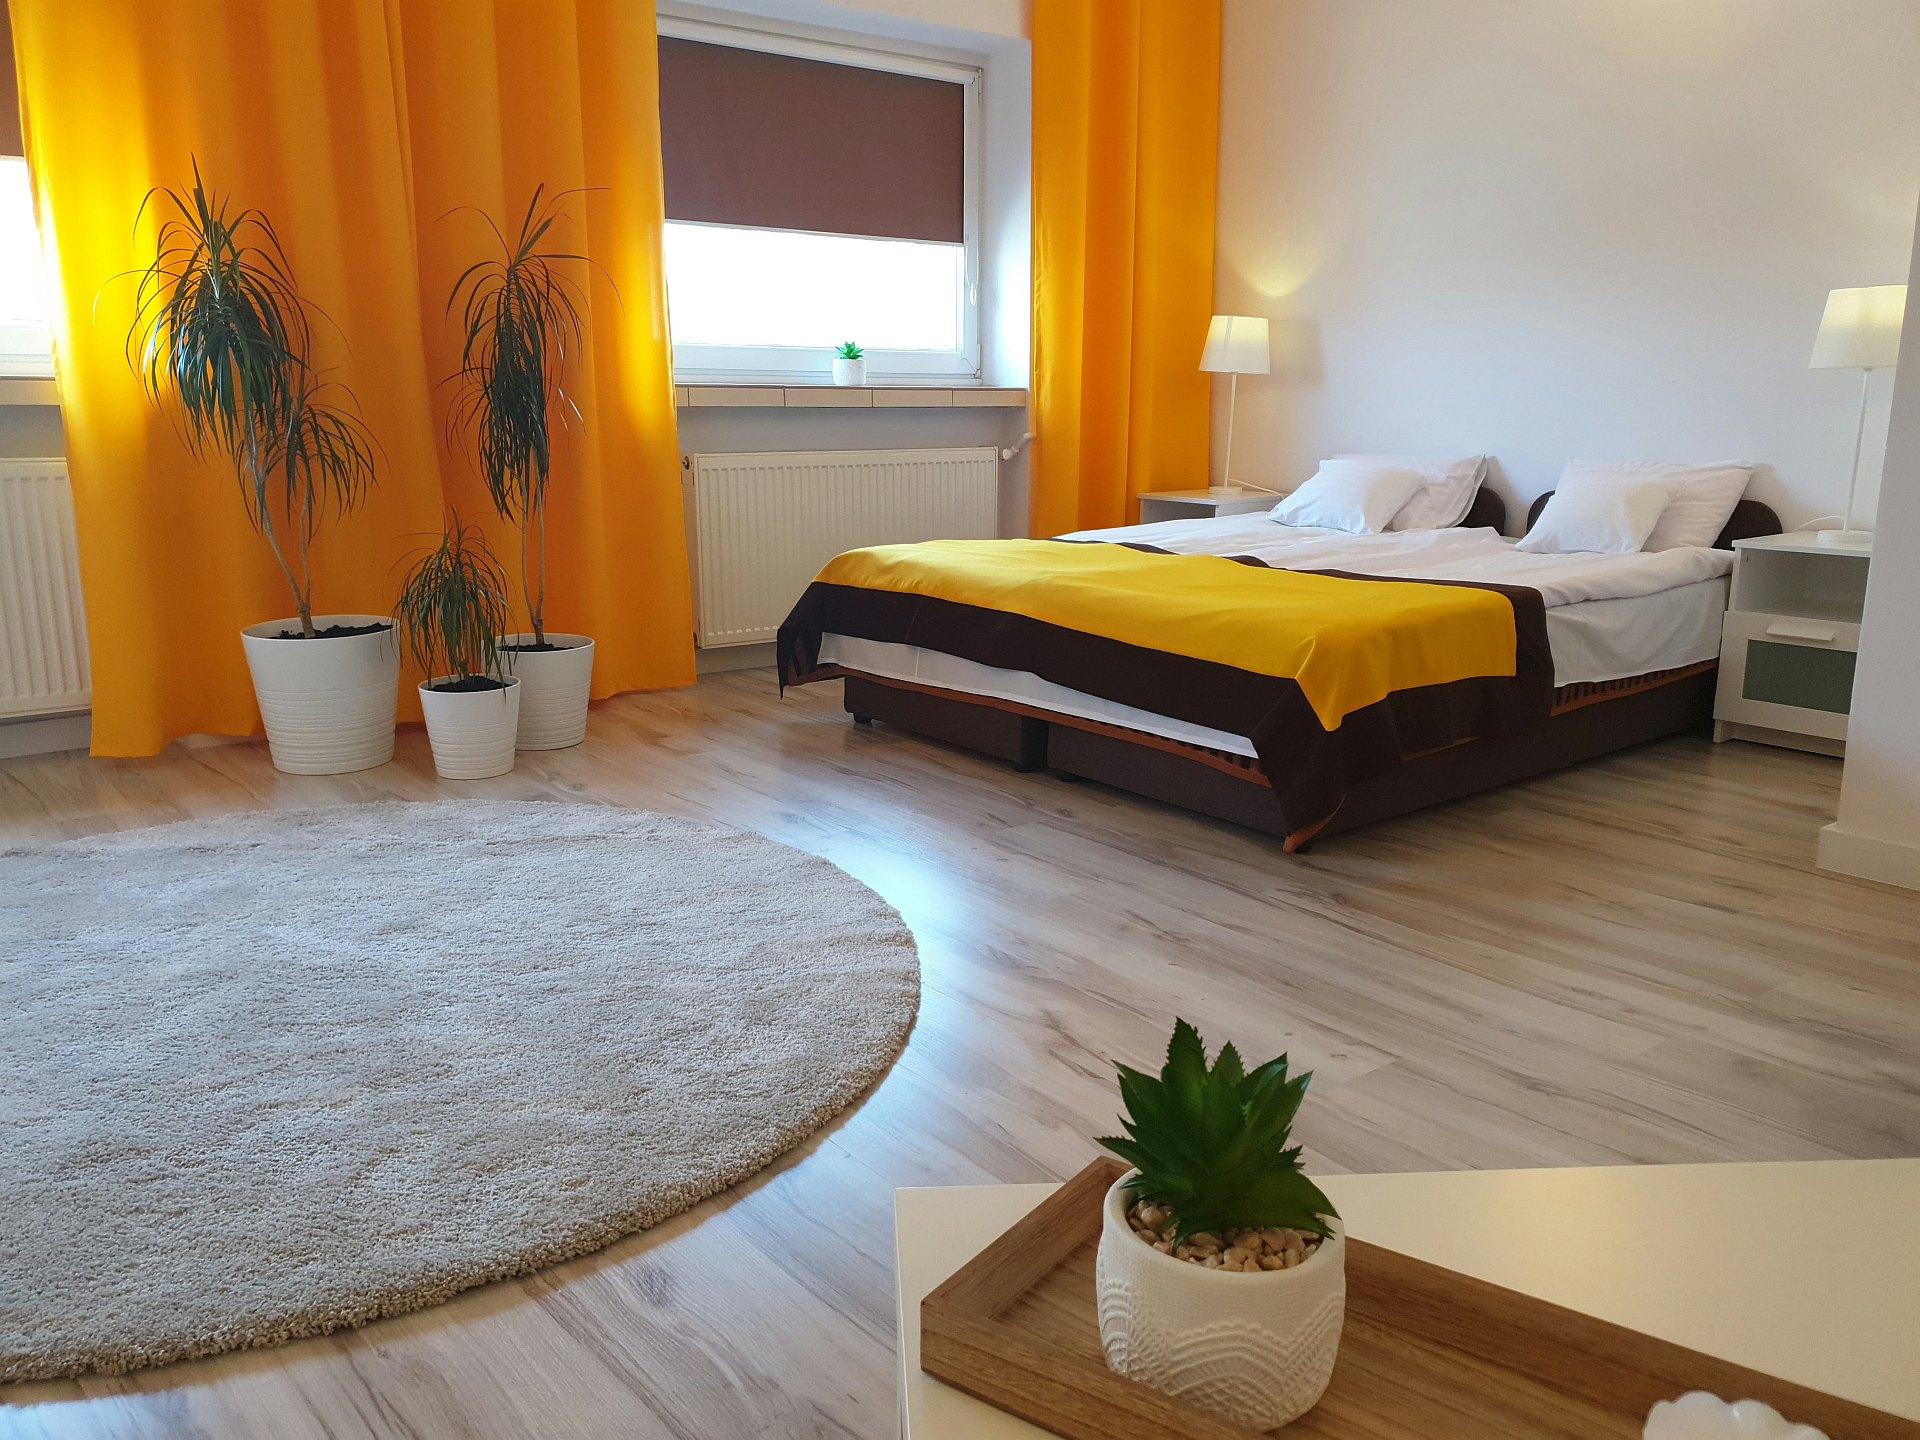 Hotel DK10